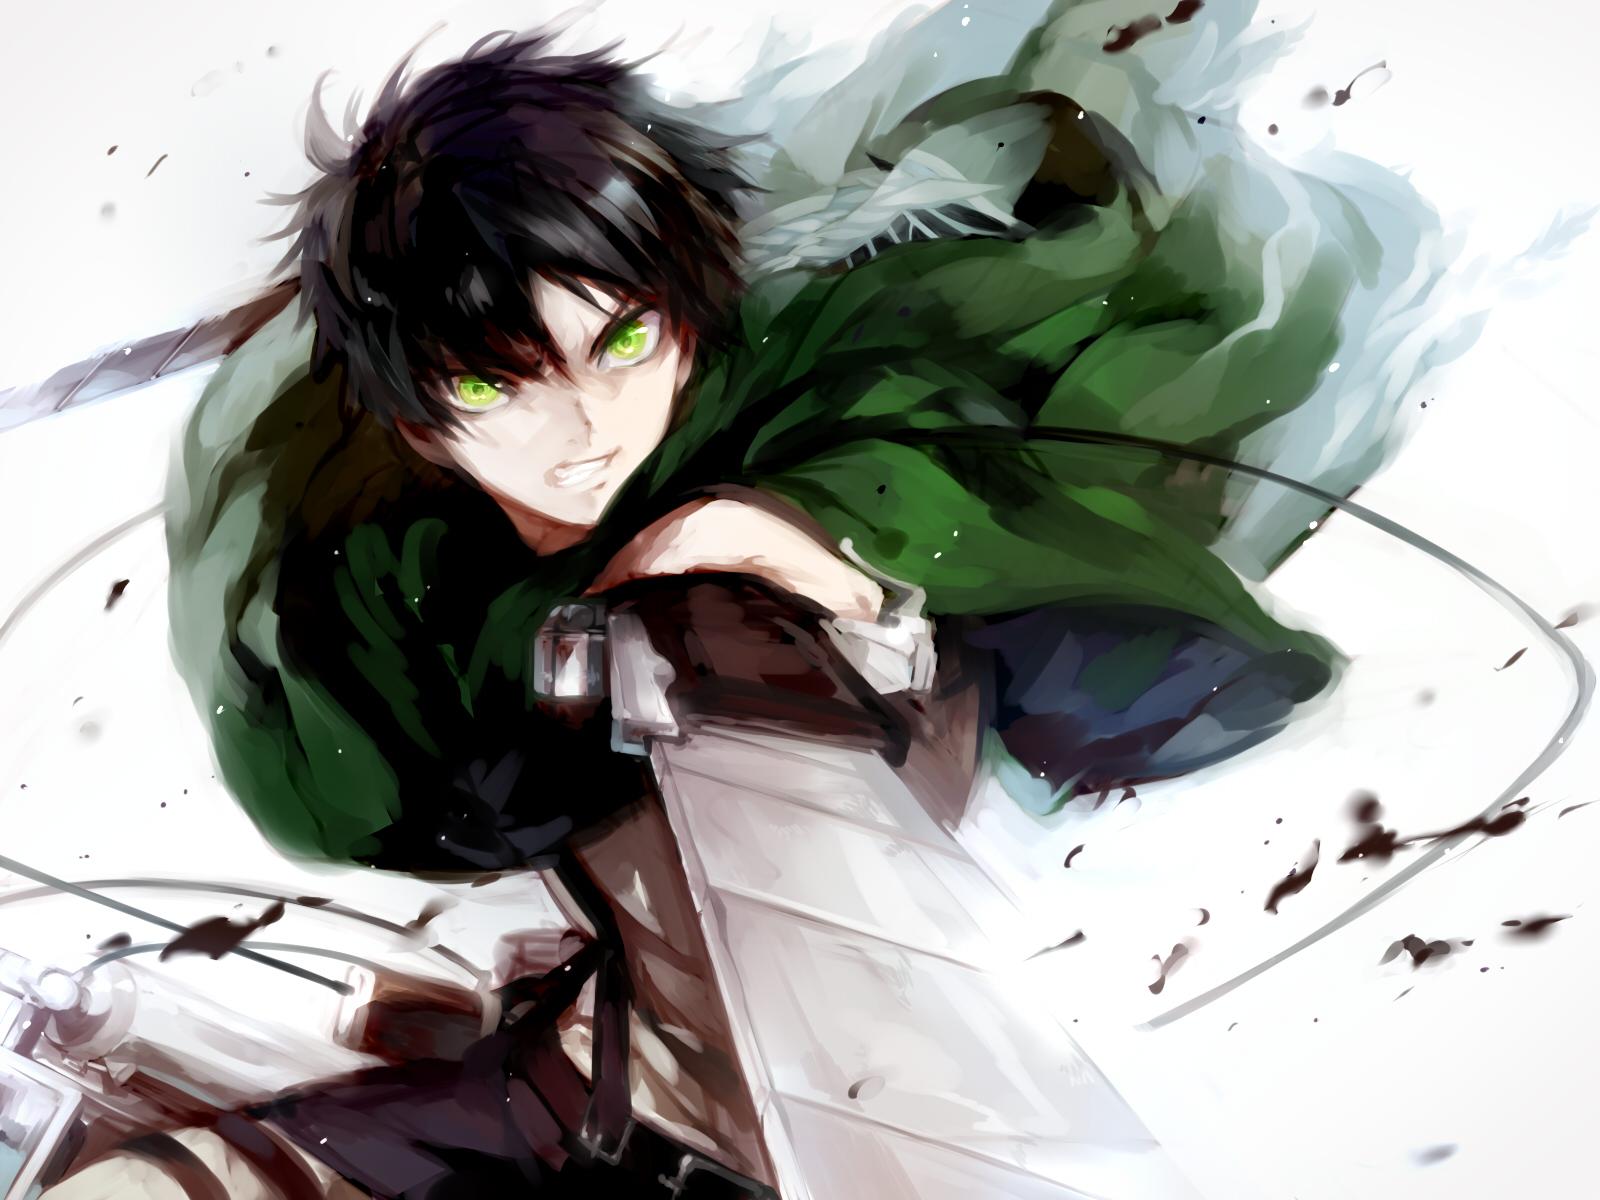 Eren Jaeger Eren Yeager Attack On Titan Zerochan Anime Image Board